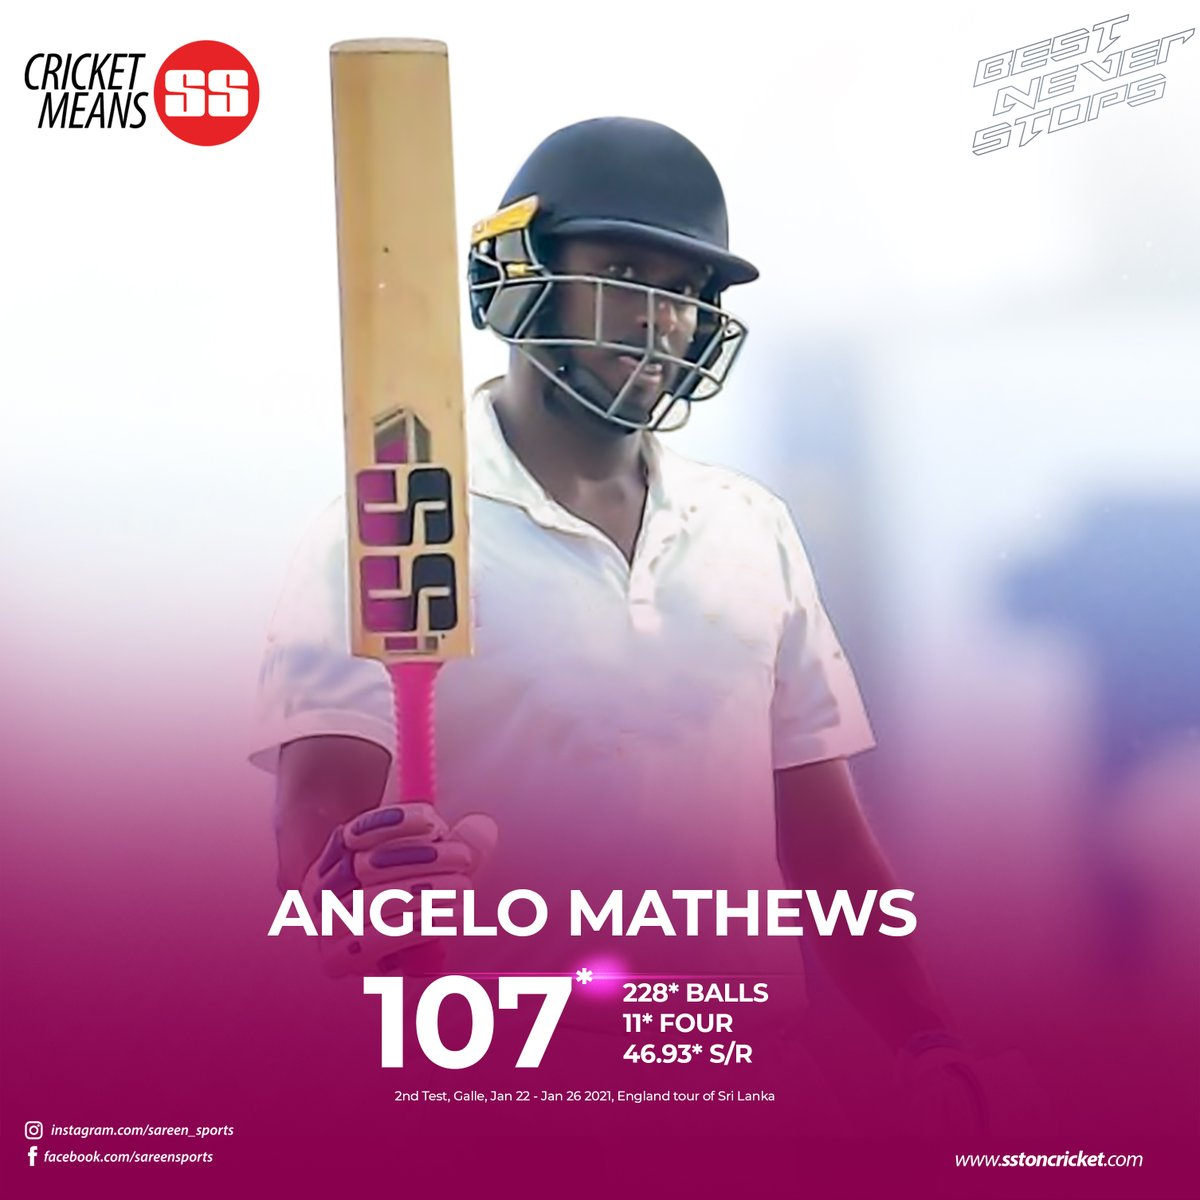 Angelo Mathews hits century on first day of second Test...  Sri Lanka vs England  #cricketmeansss #cricket #bestneverstops #ssbats #teamsston #tonbats   https://t.co/iwkyke955L https://t.co/qTT3WJyBqo